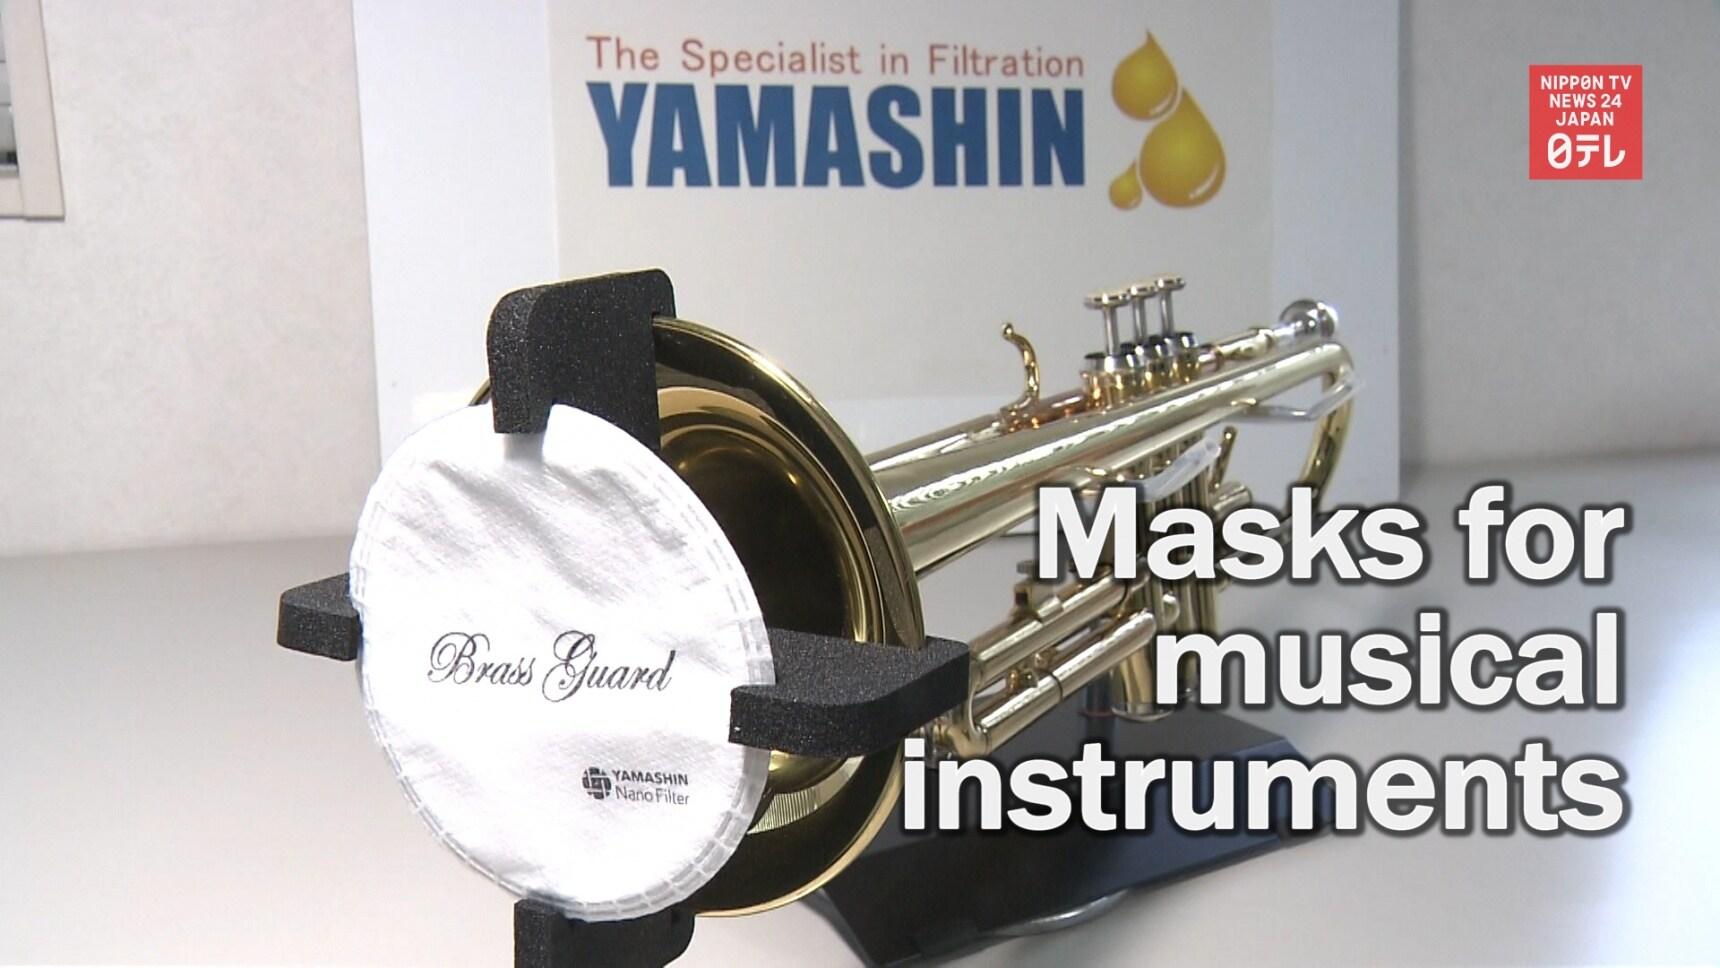 Masks for Musical Instruments